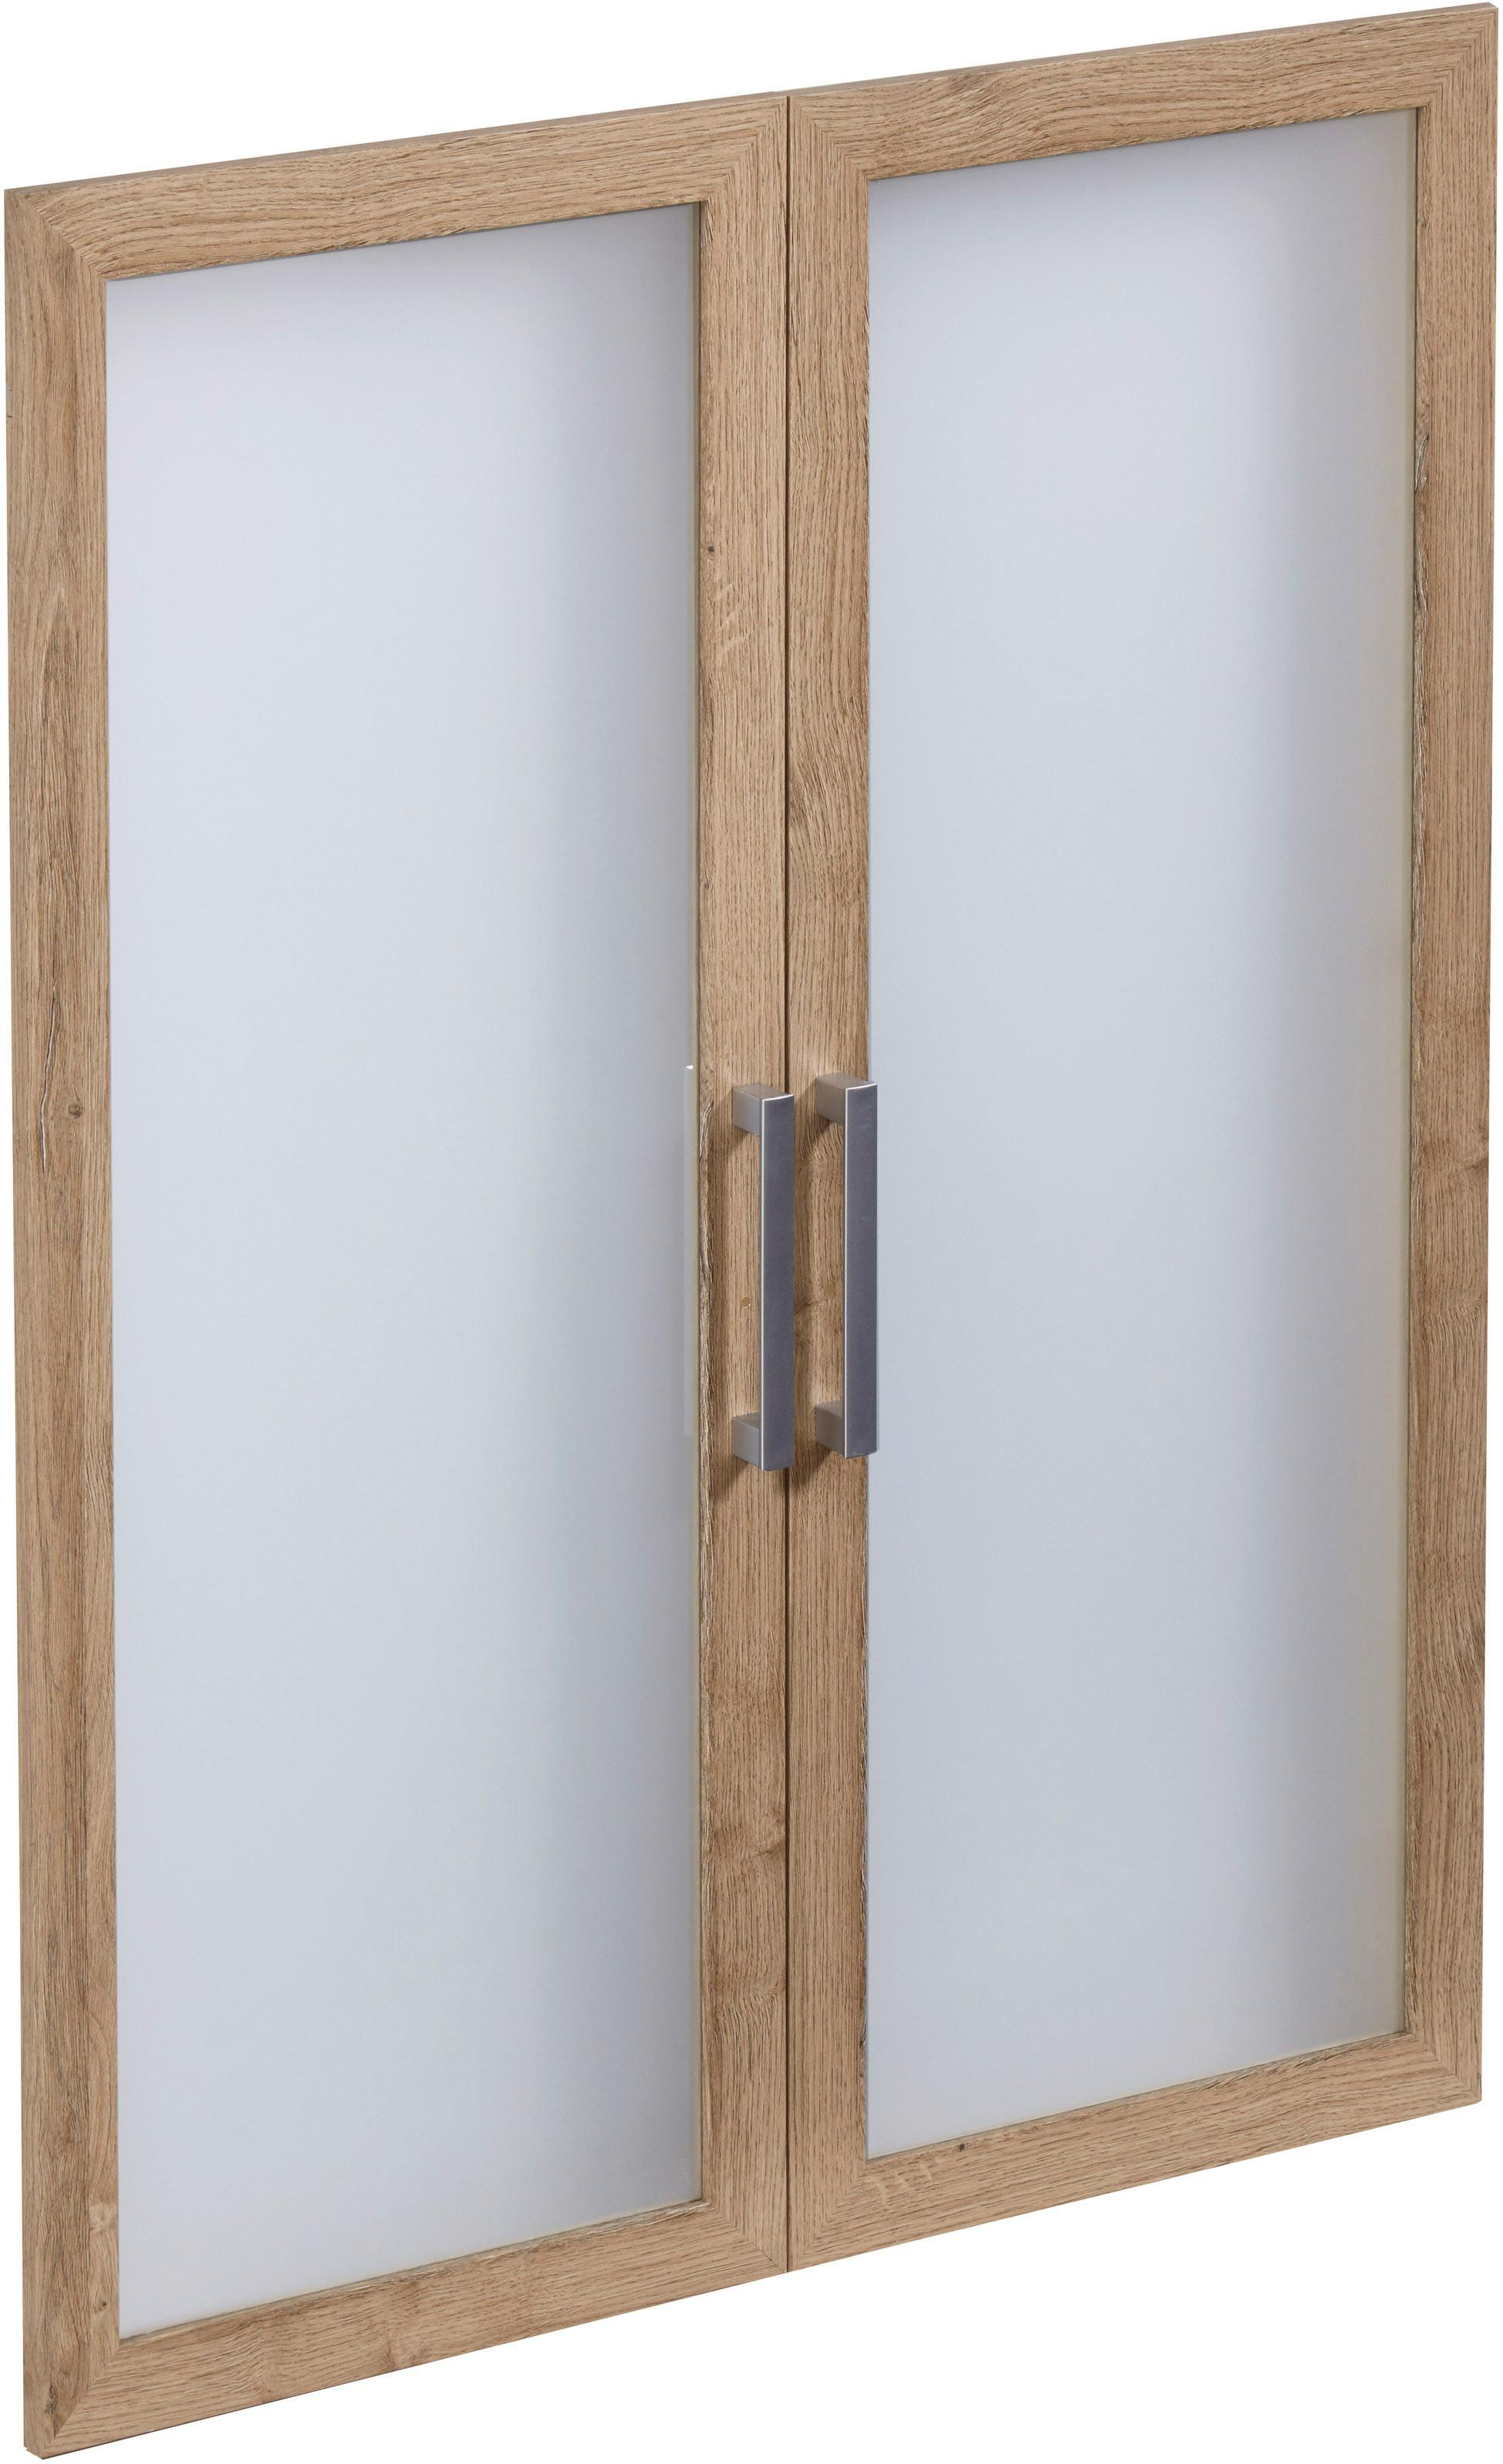 FMD Glastüren-Set »Calvi« | Wohnzimmer > Vitrinen > Glasvitrinen | Natur | Kunststoff - Melamin | QUELLE